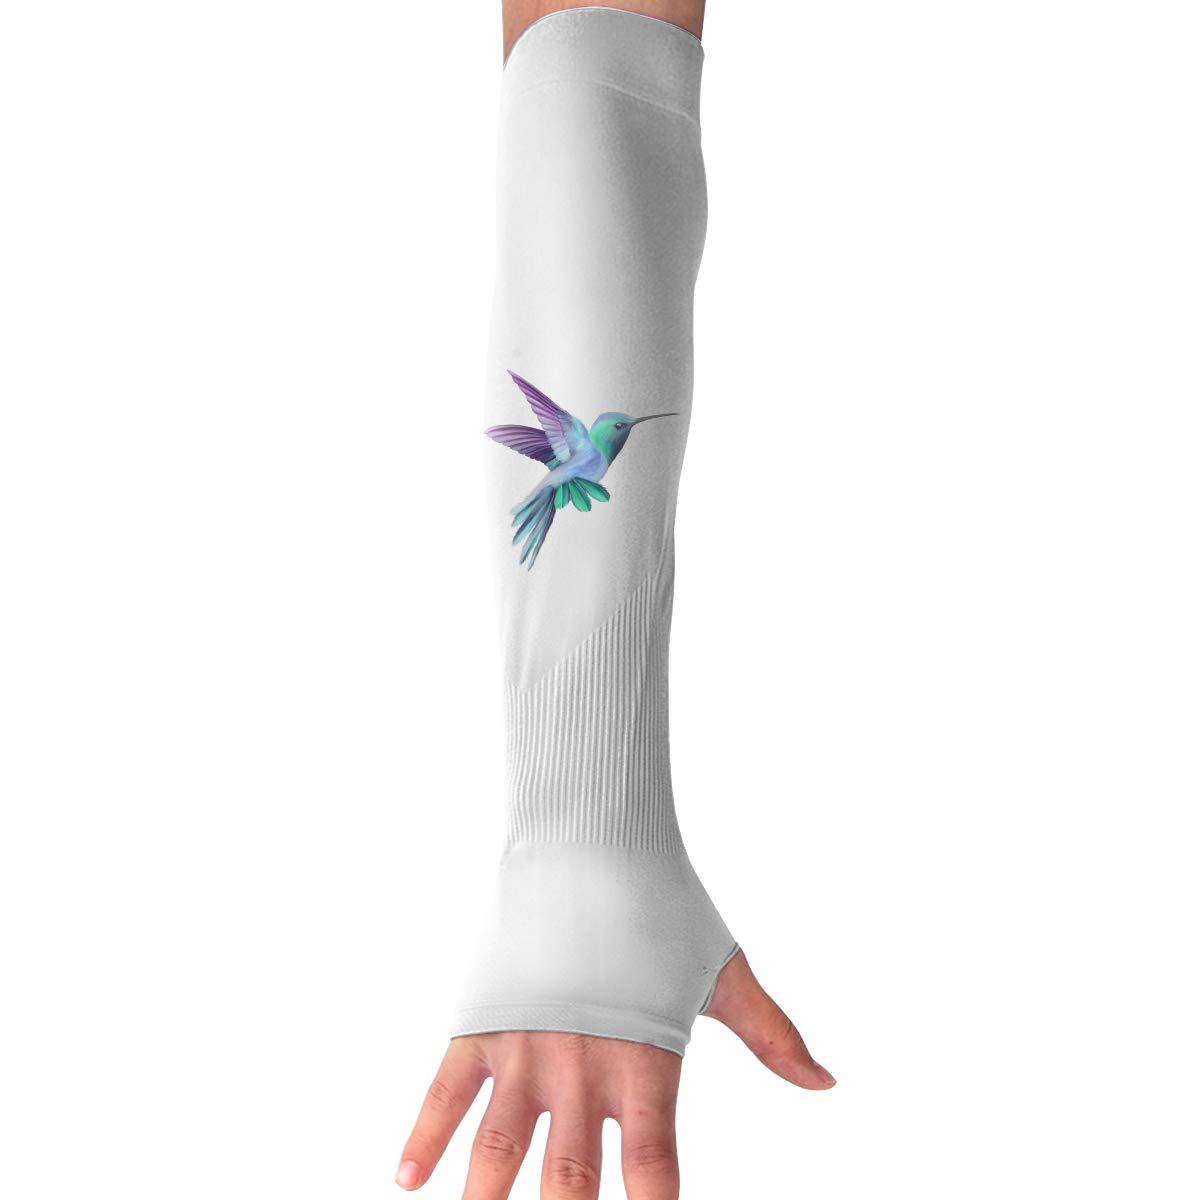 WAY.MAY Hummingbird Protection Cooling Warmer Long Arm Sleeves Sunblock Protective Fingerless Gloves Outdoor Sun Sleeve